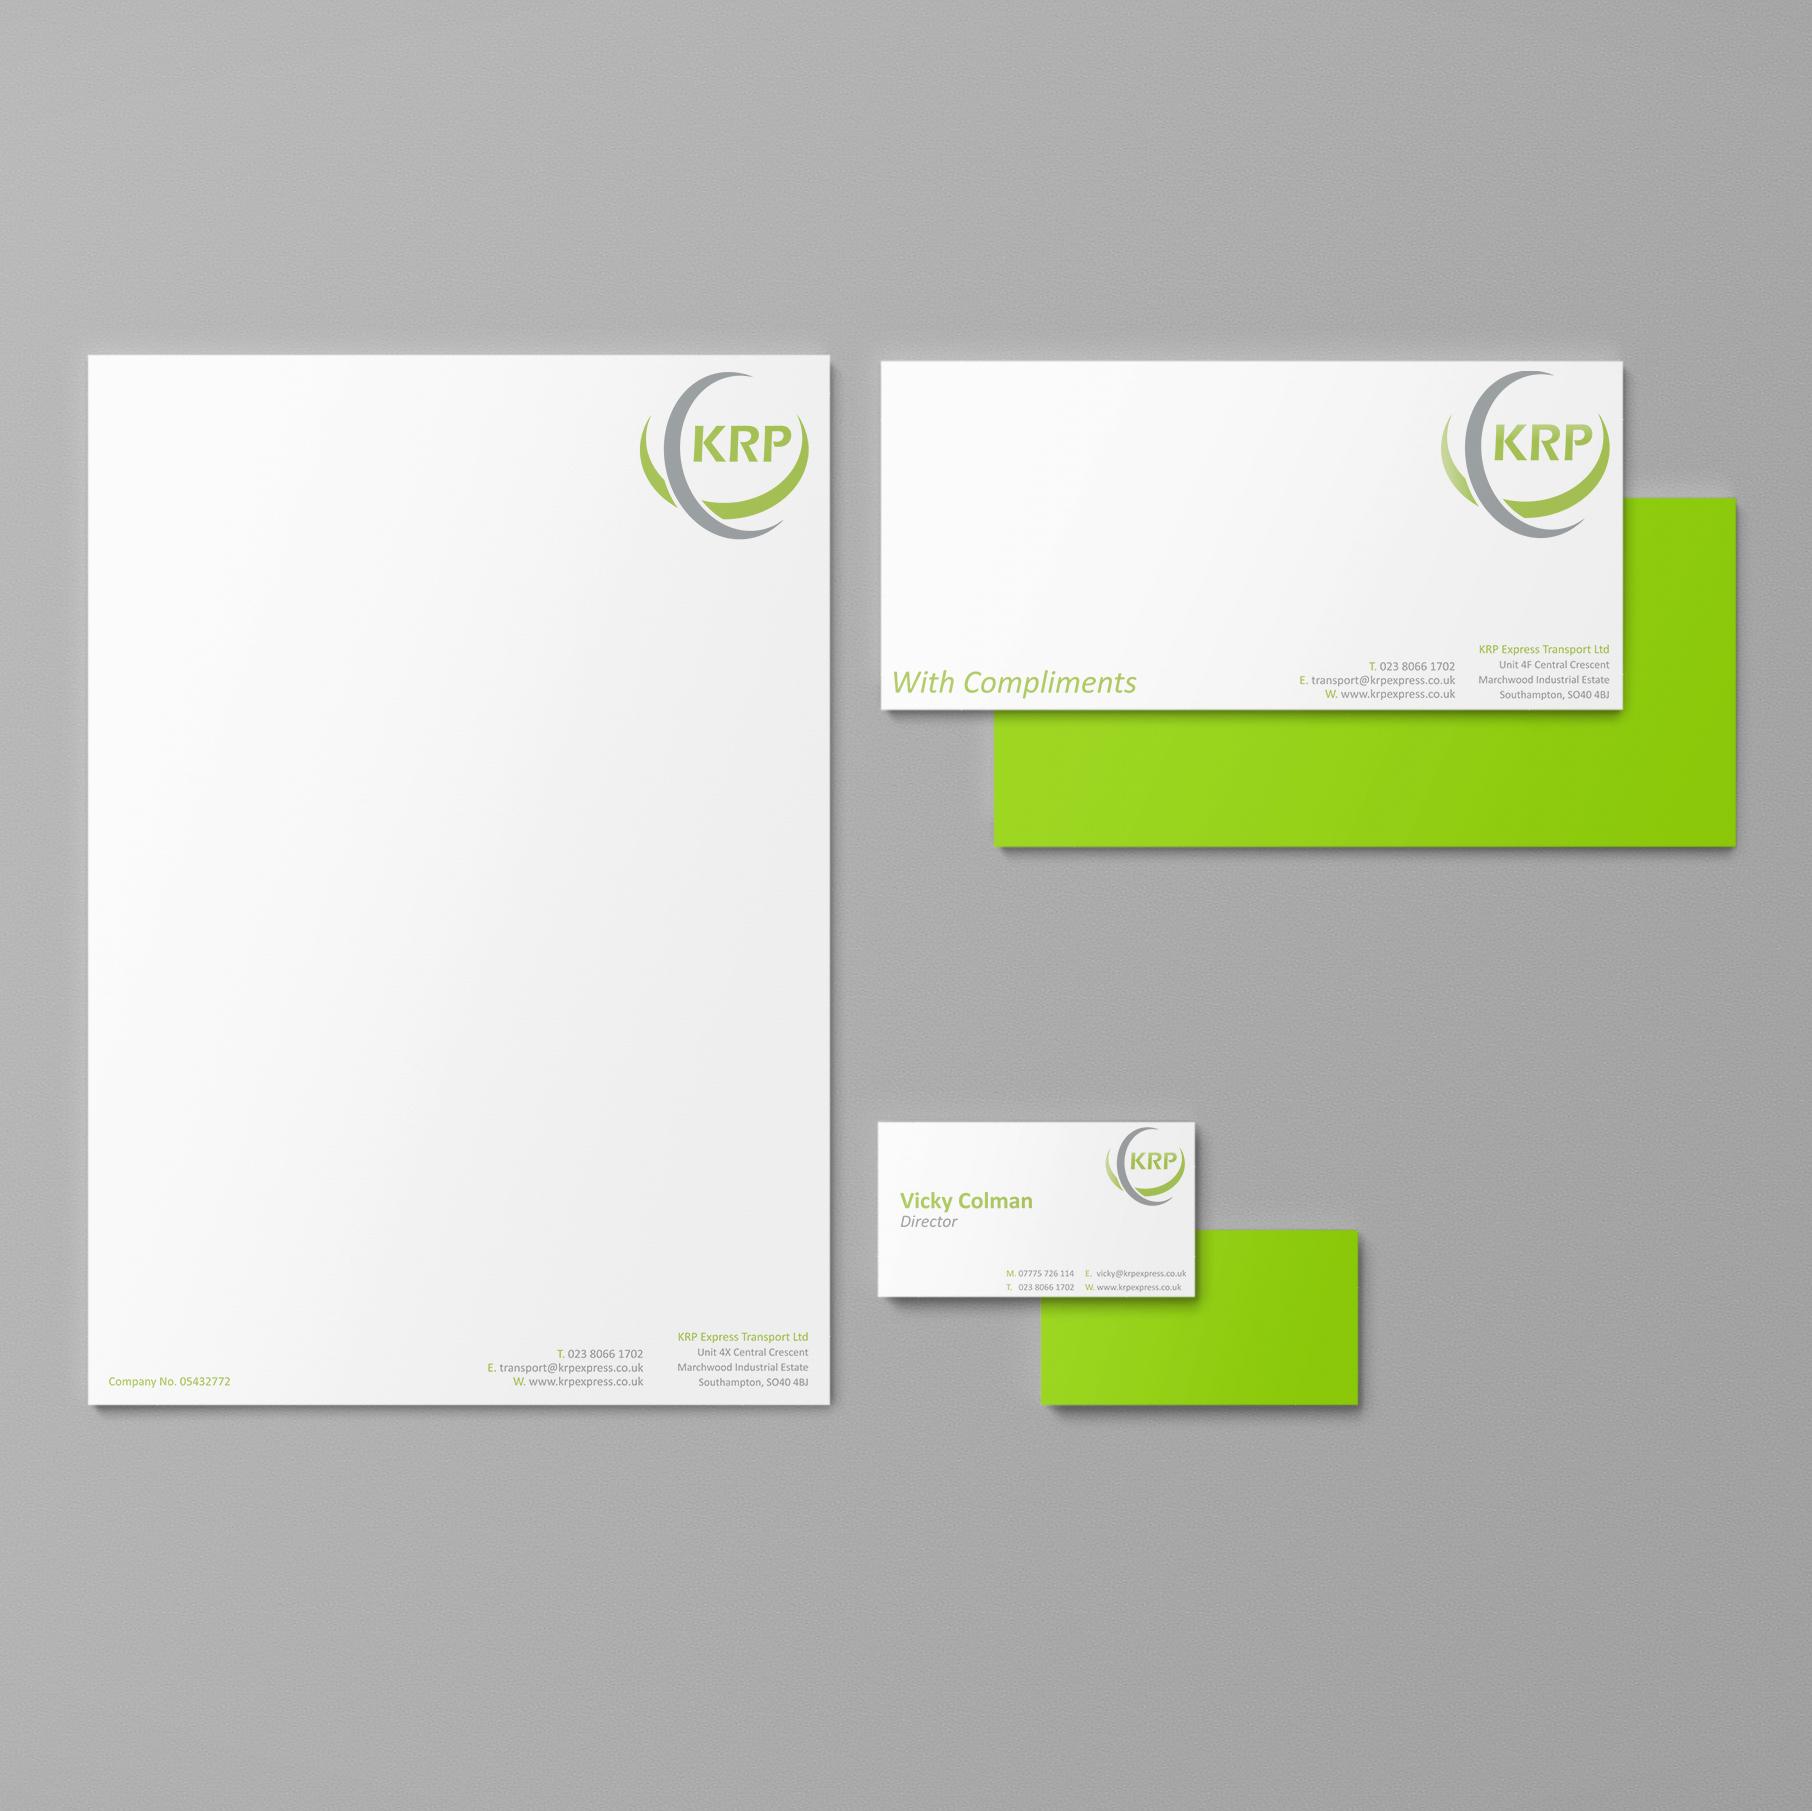 KRP corporate ID design